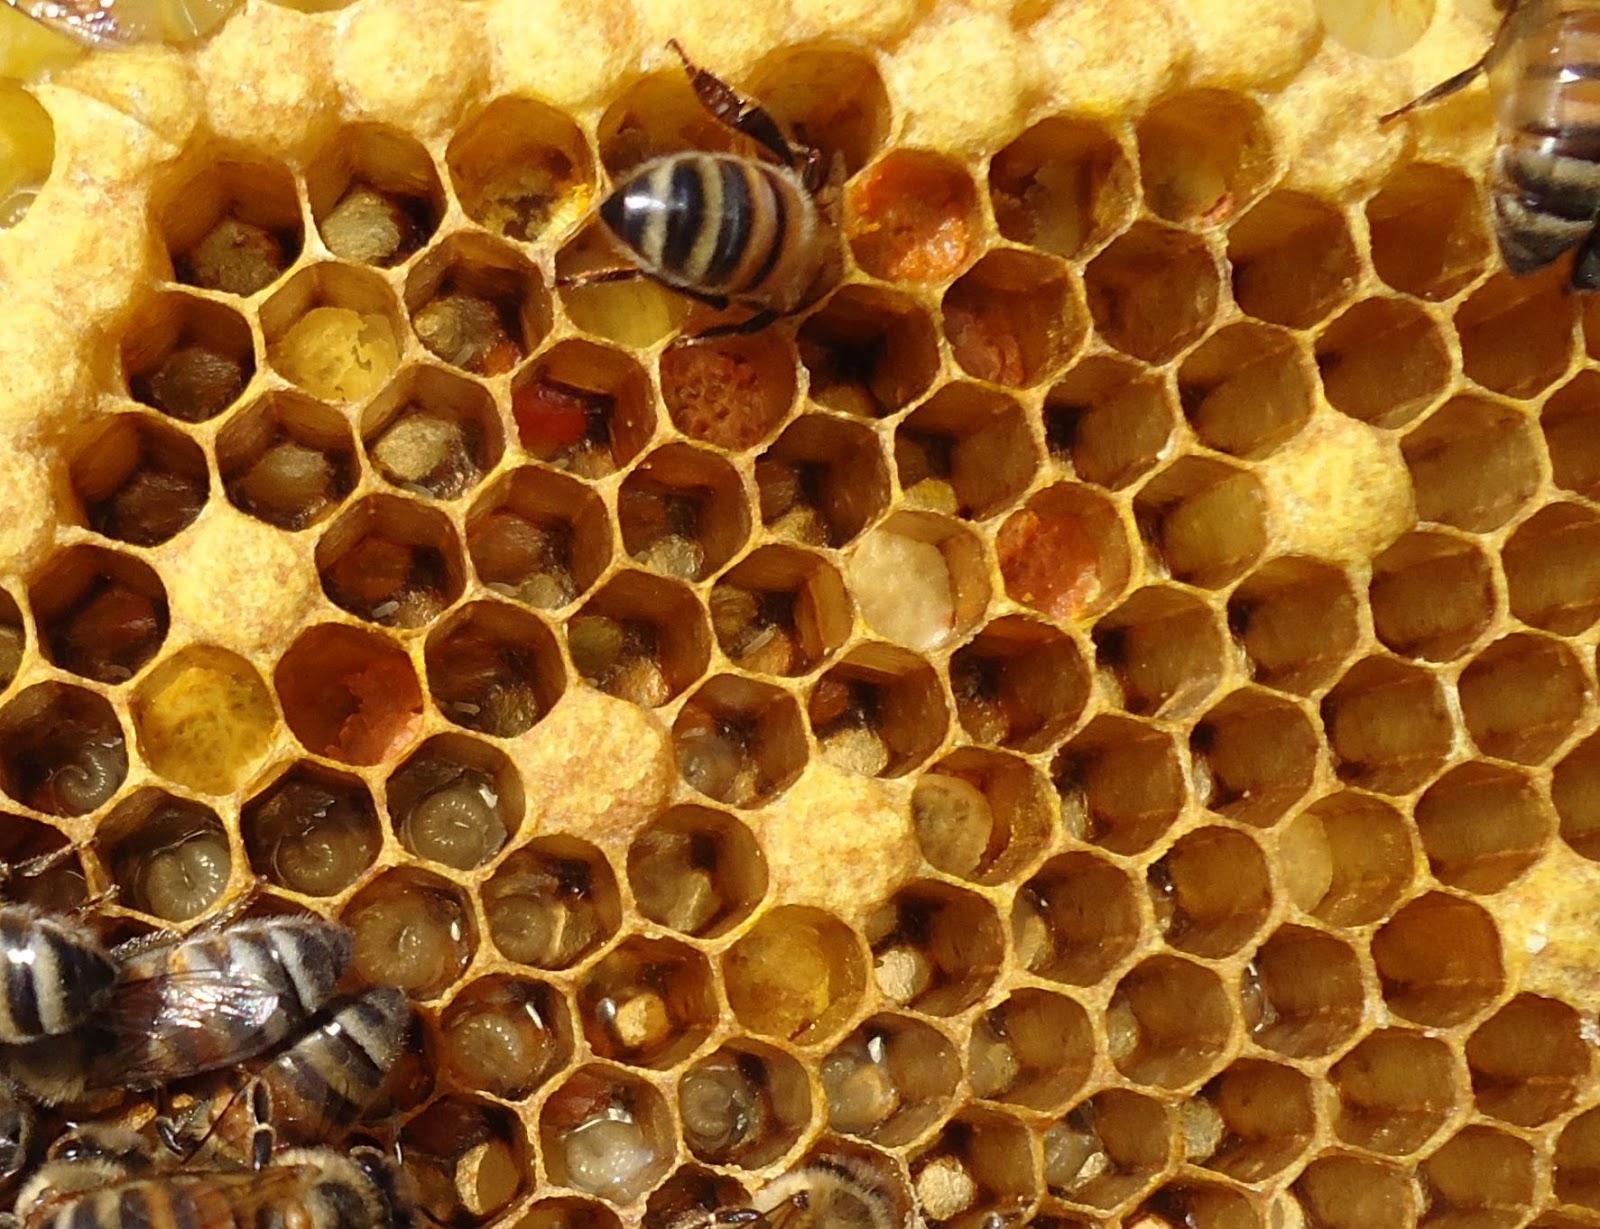 Long Beach Beekeepers News